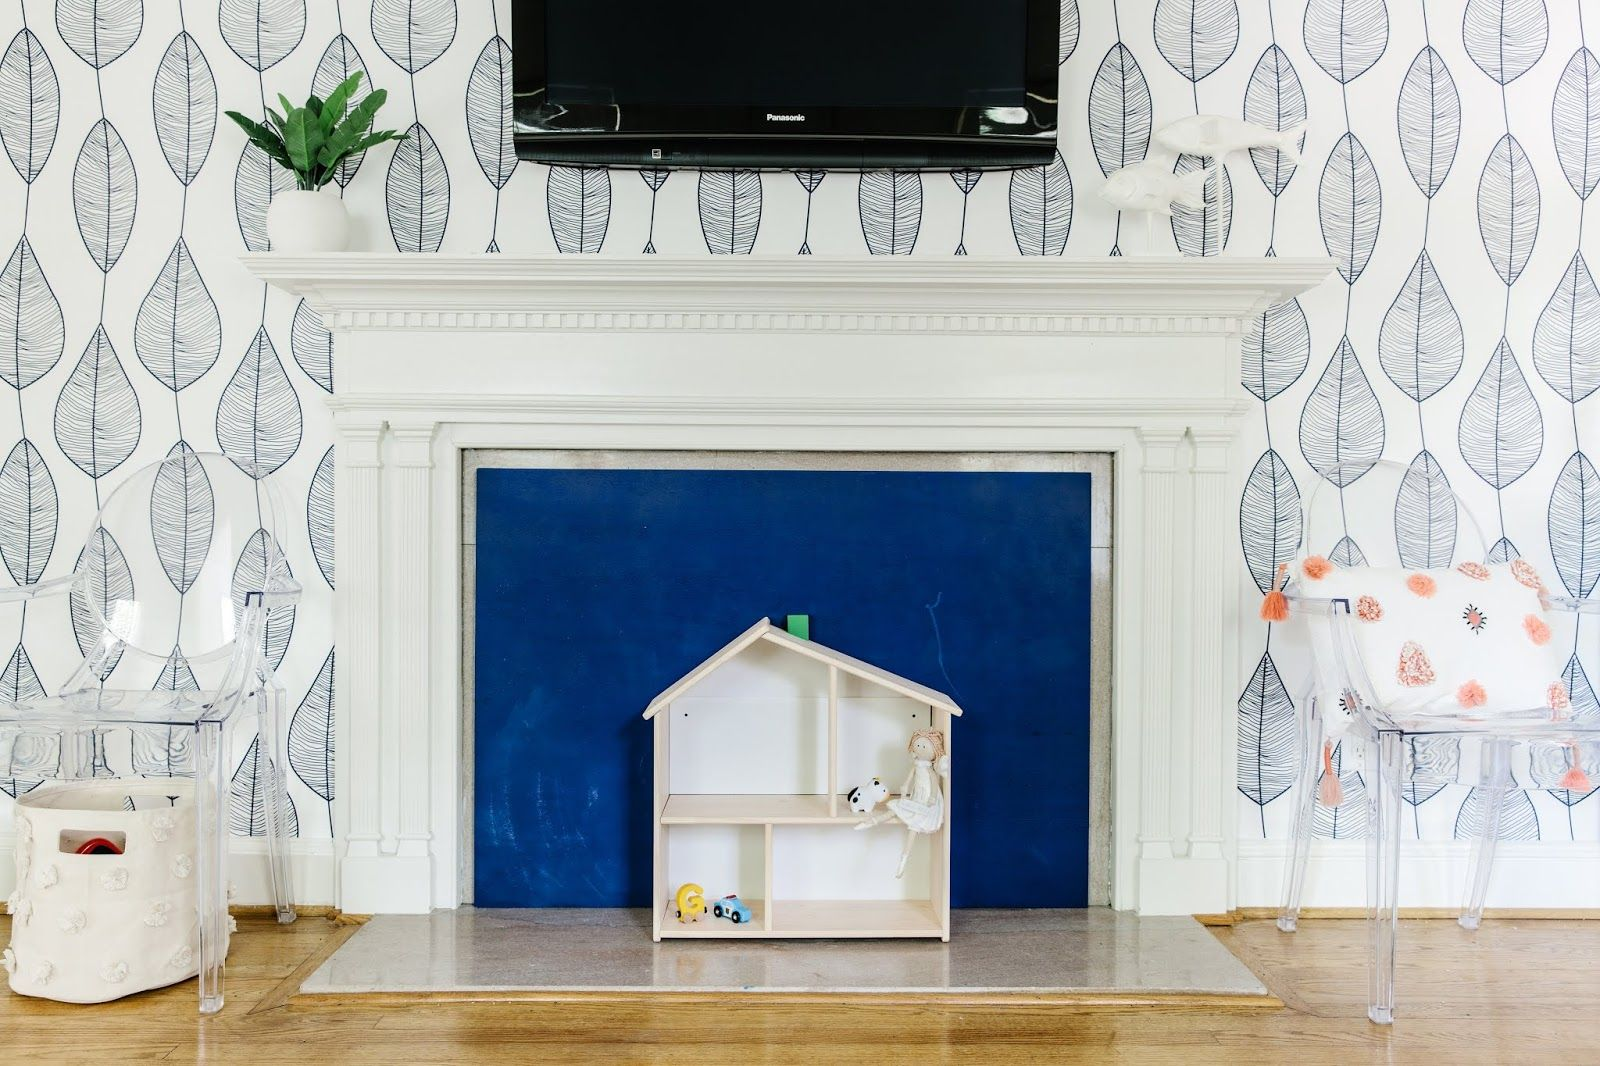 Diy chalkboard fireplace cover playroom design blue